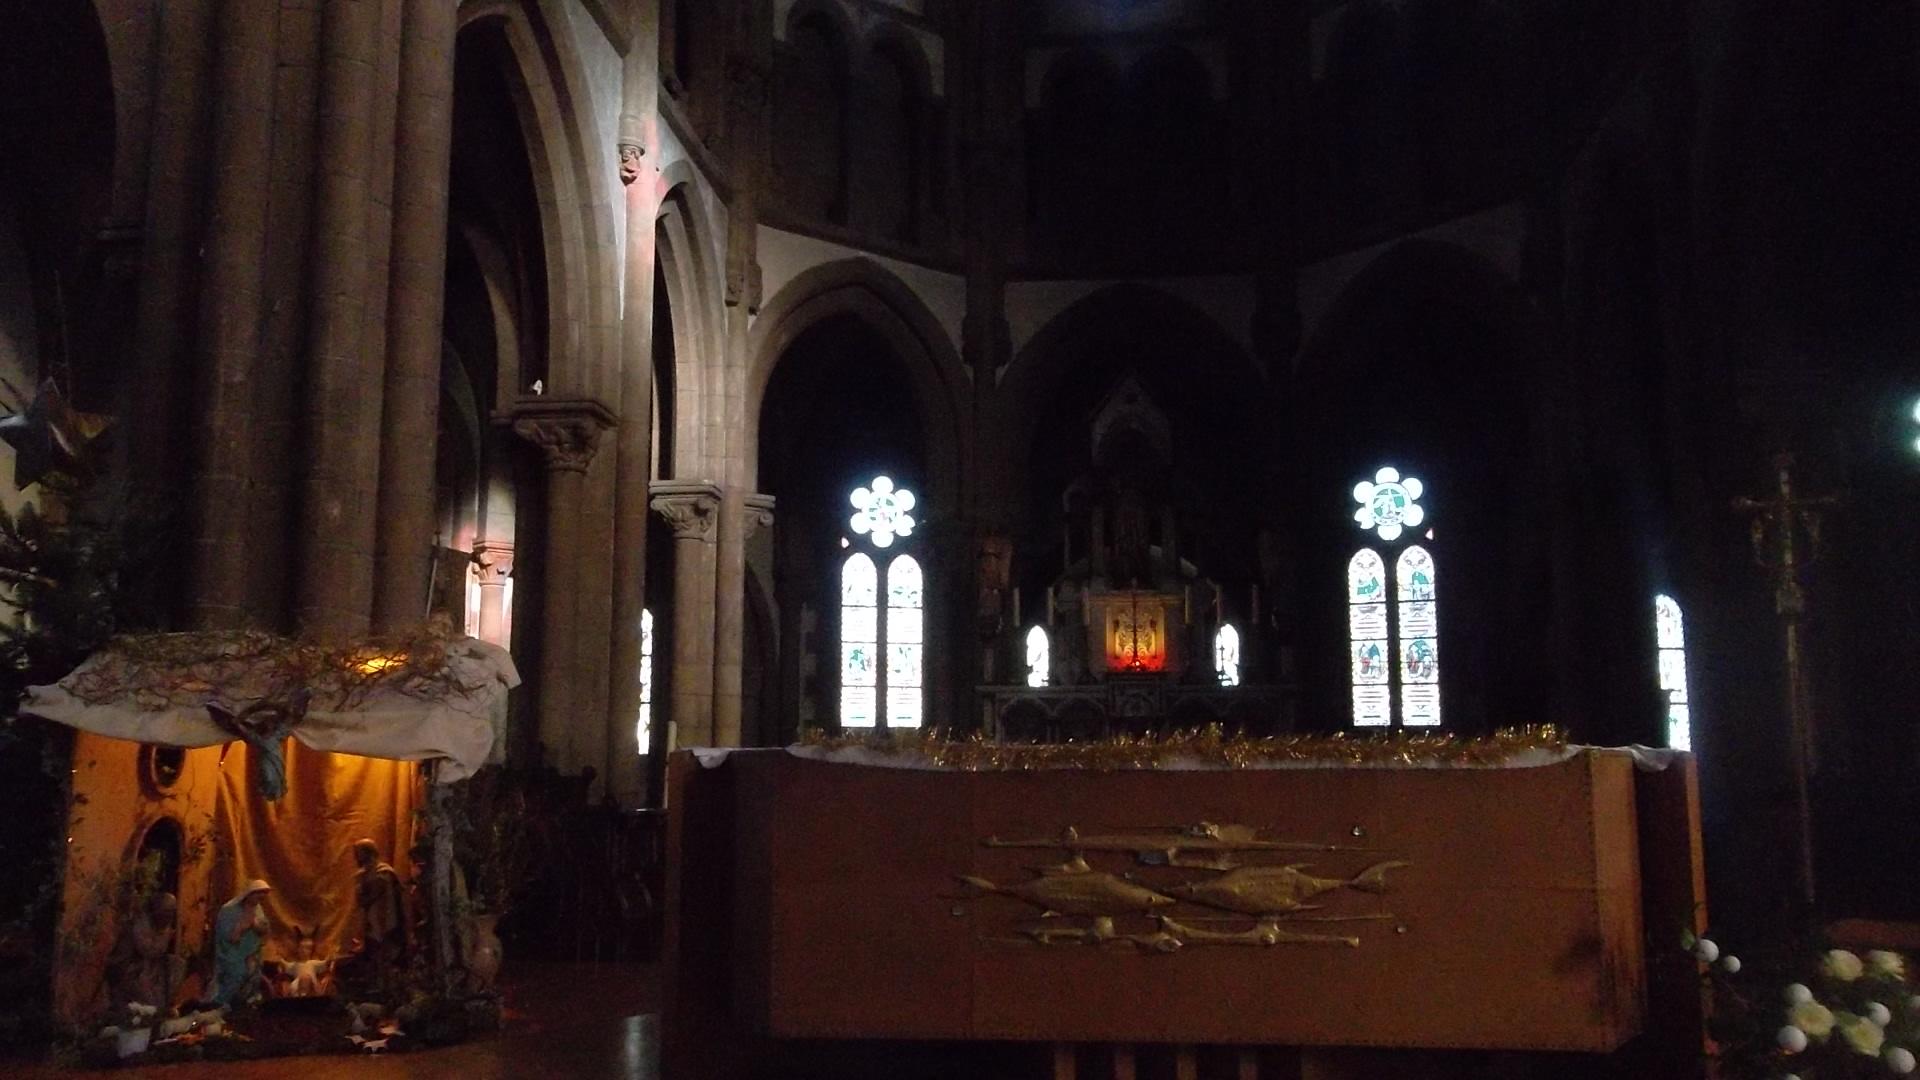 douarnenez-ch-st-herle-altar-dec13